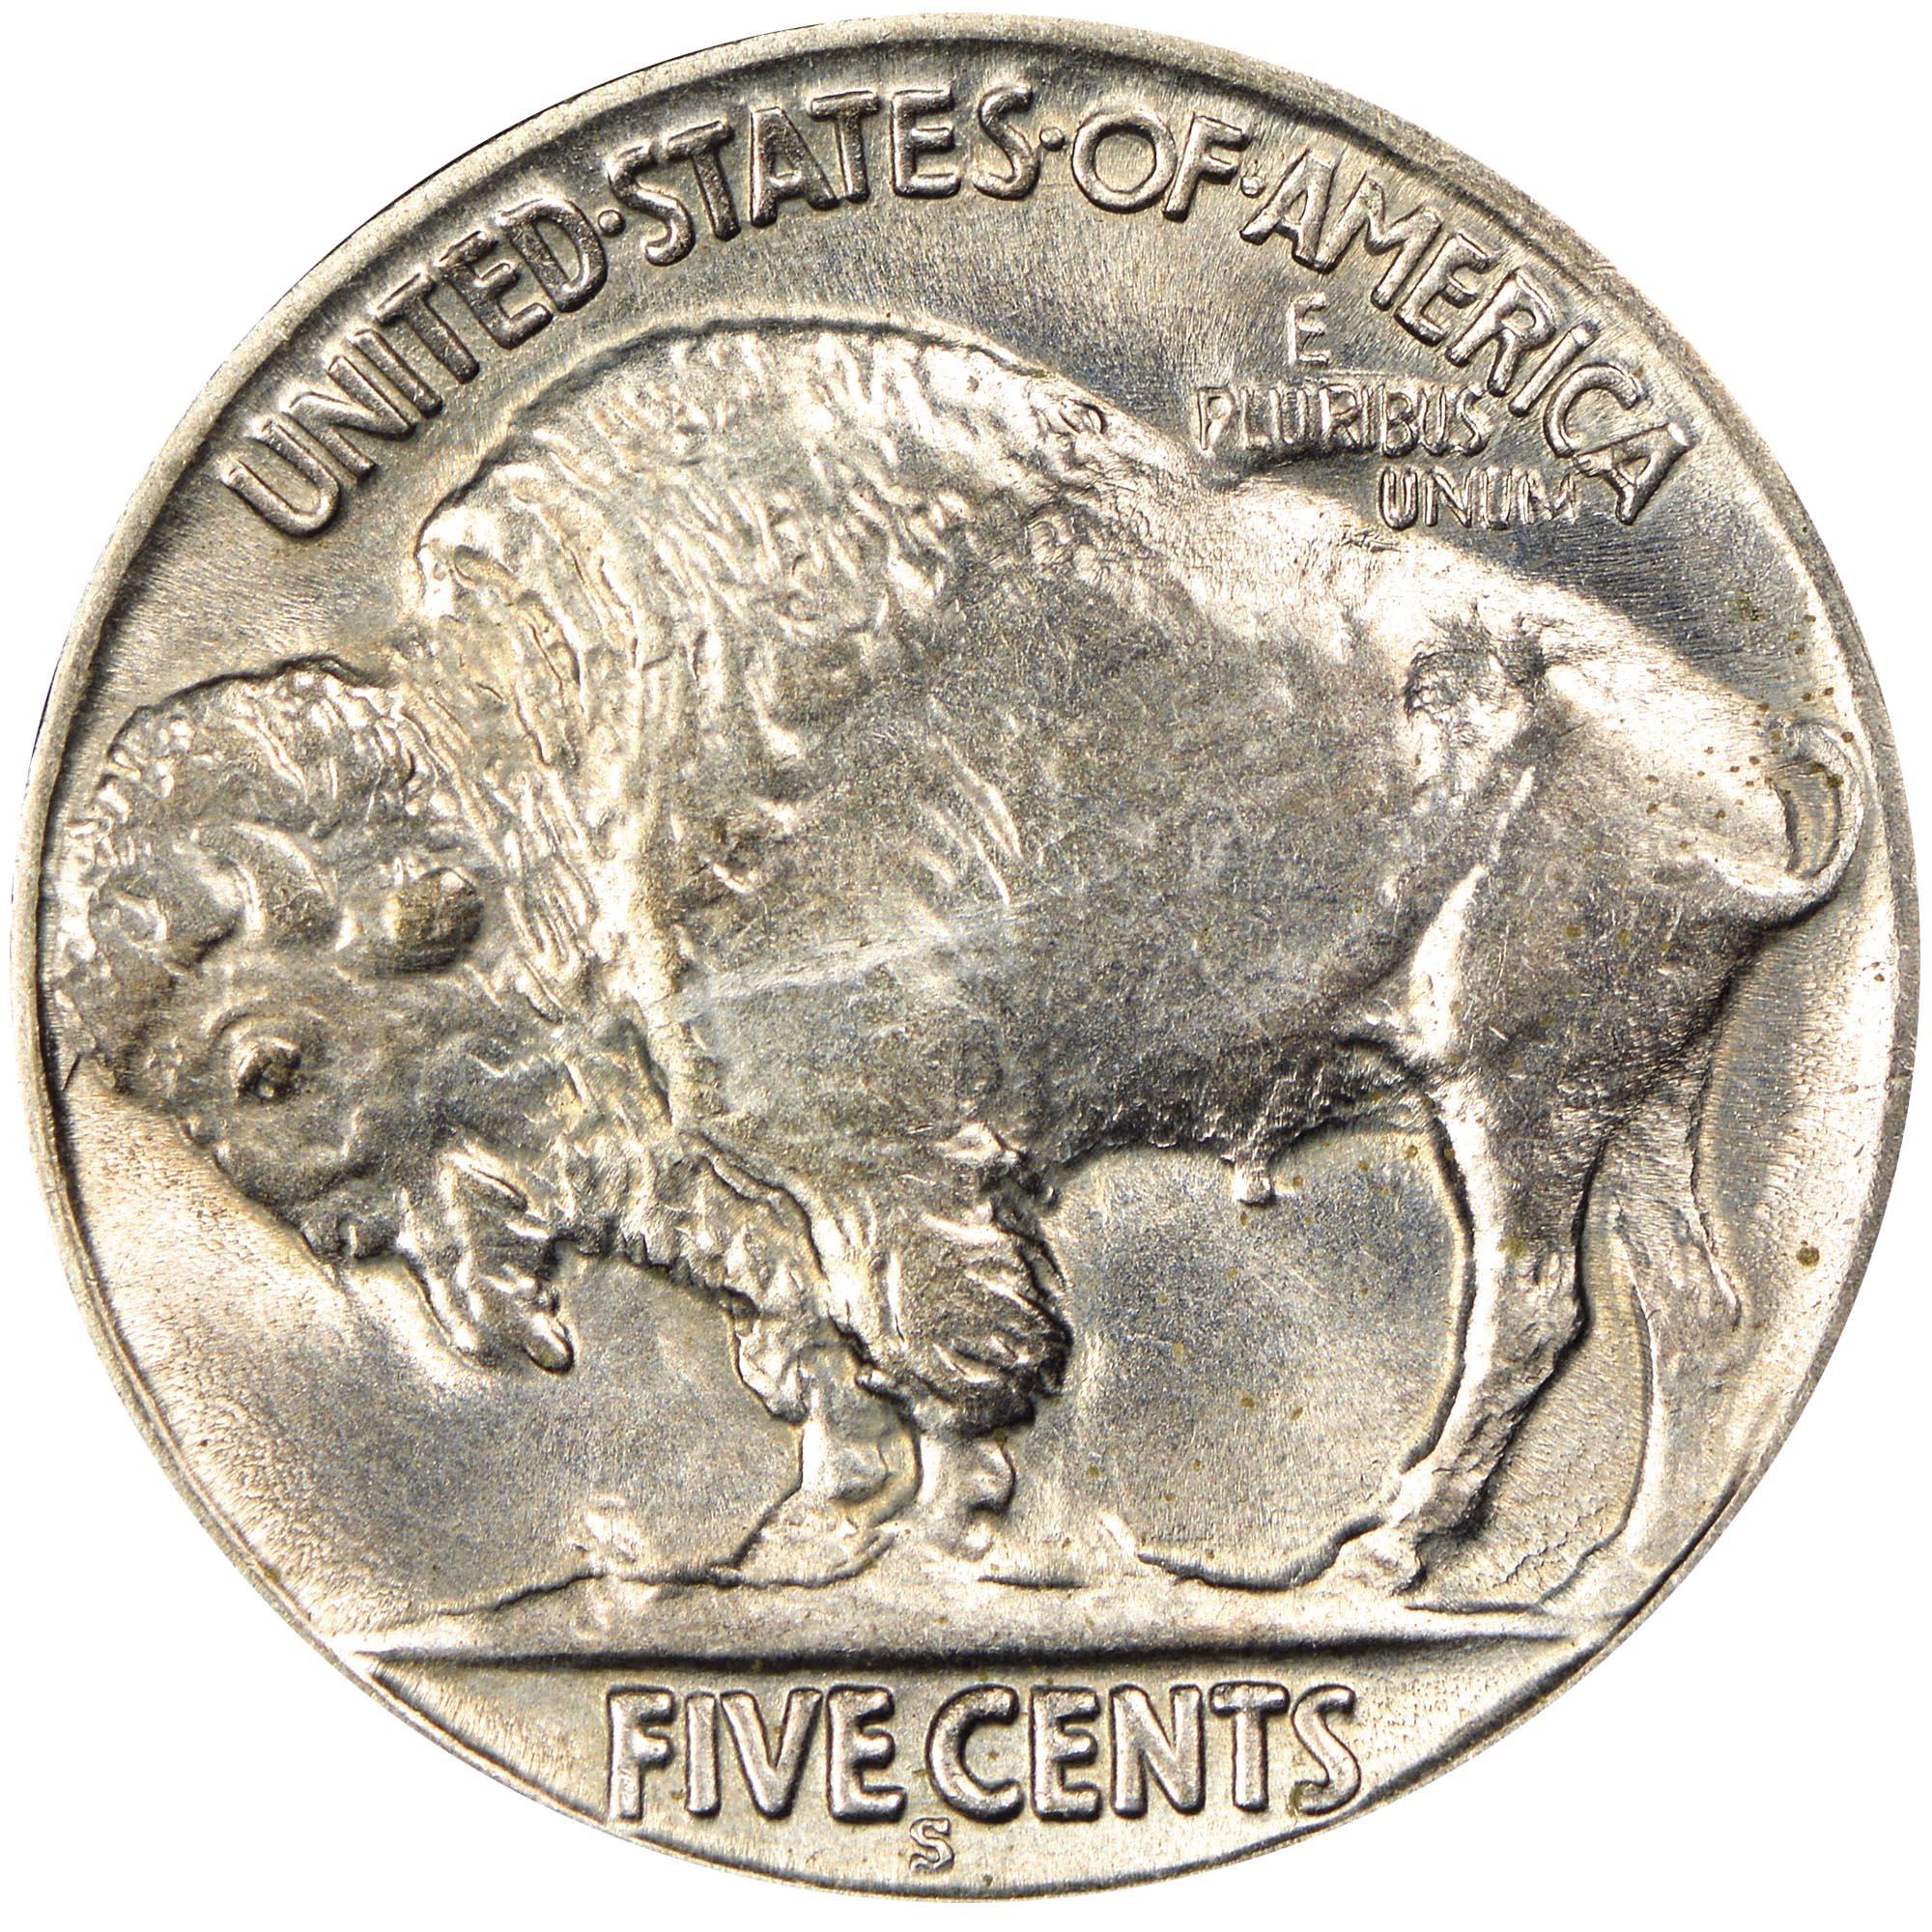 1923-S Buffalo Nickel in Very Good